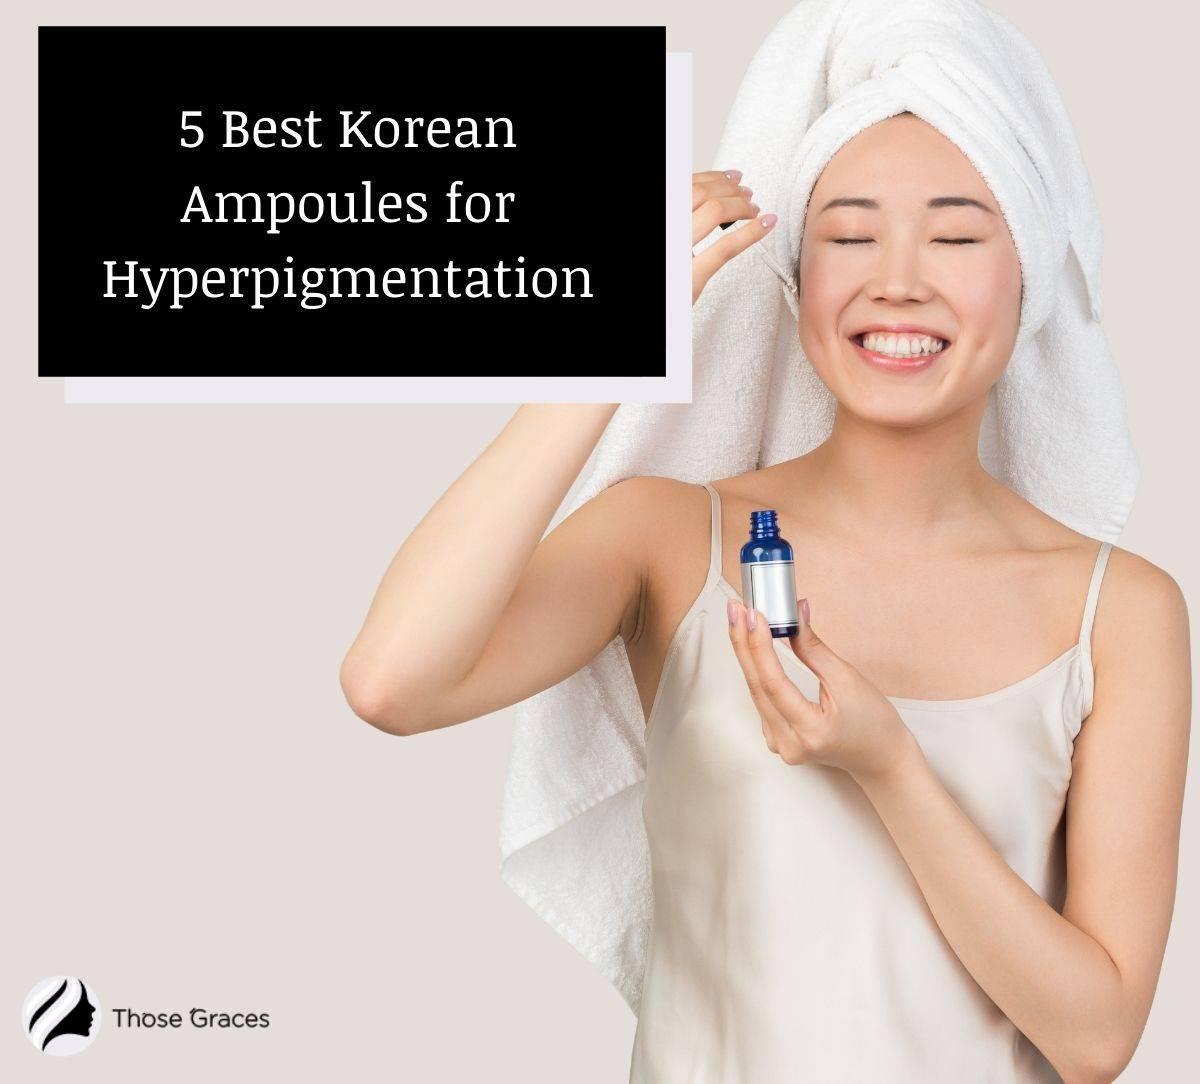 a smiling Korean girl applying Best Korean Ampoule for Hyperpigmentation to her face